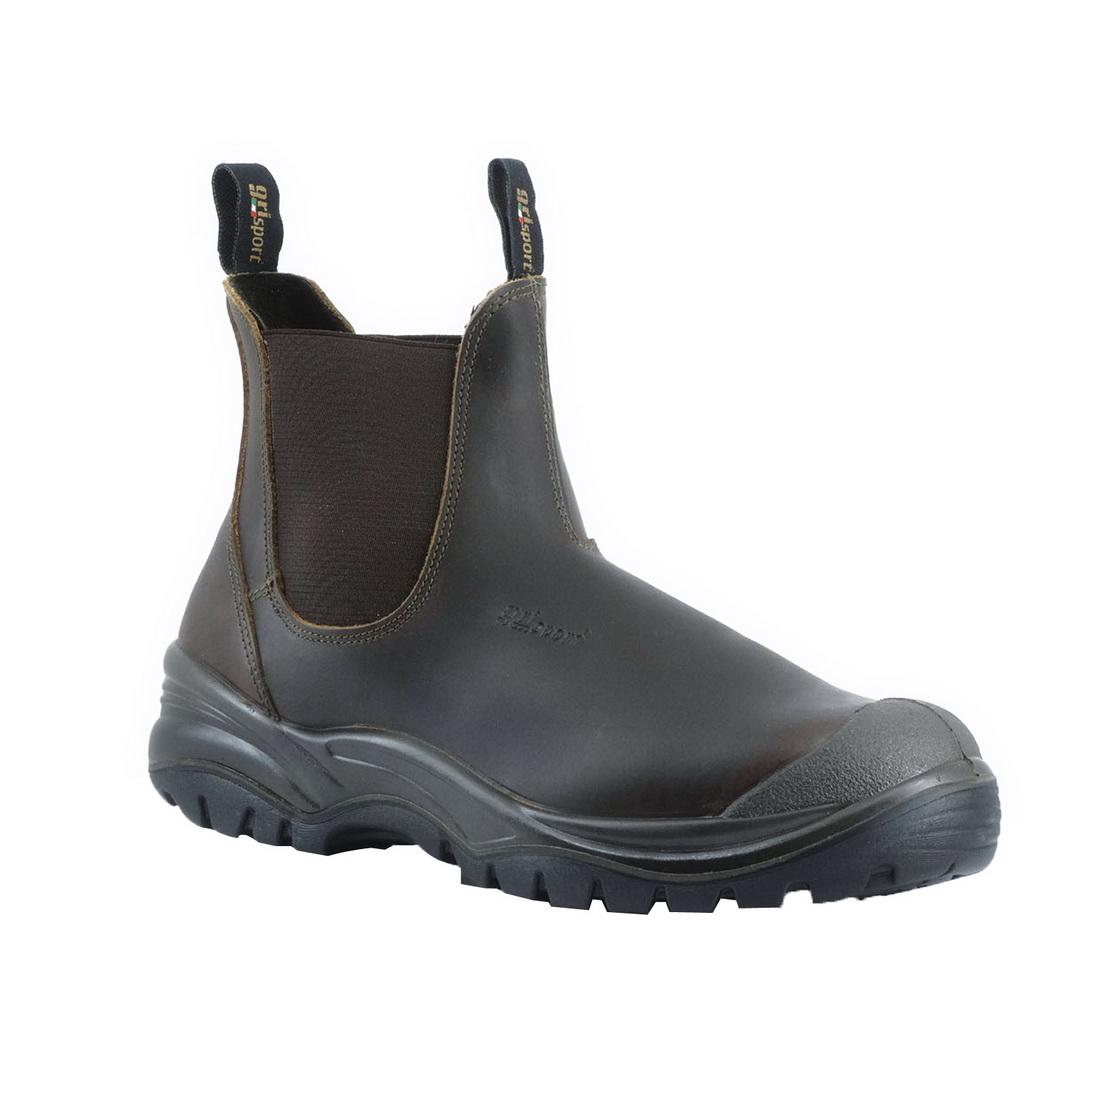 Genoa Safety Slip On Safety Boot Size 8 Brown Dakar Leather